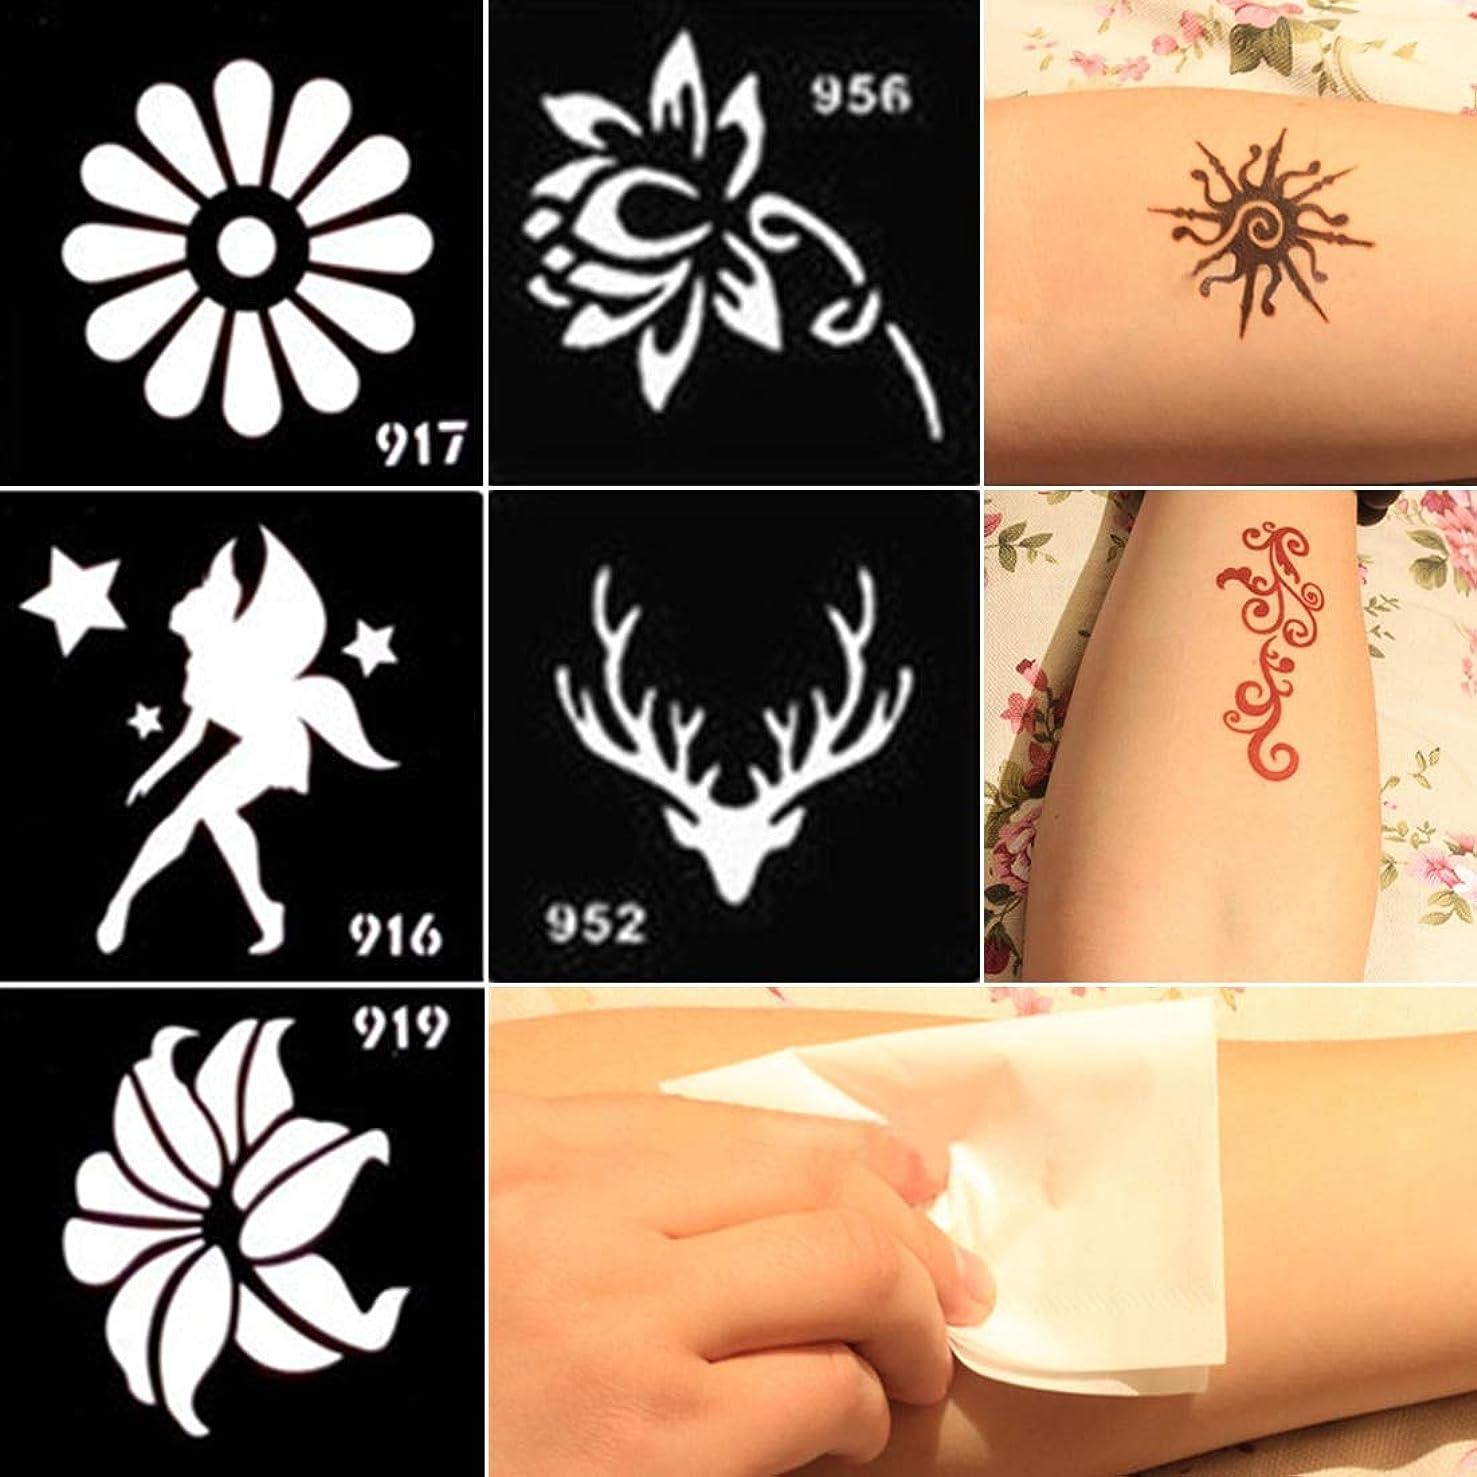 Henna Stencils Odorless Tattoo Cream Hand Paint Cream Special Template Small Henna Tattoo Mould DIY Airbrush Paint Mehndi Henna Indian Tattoo